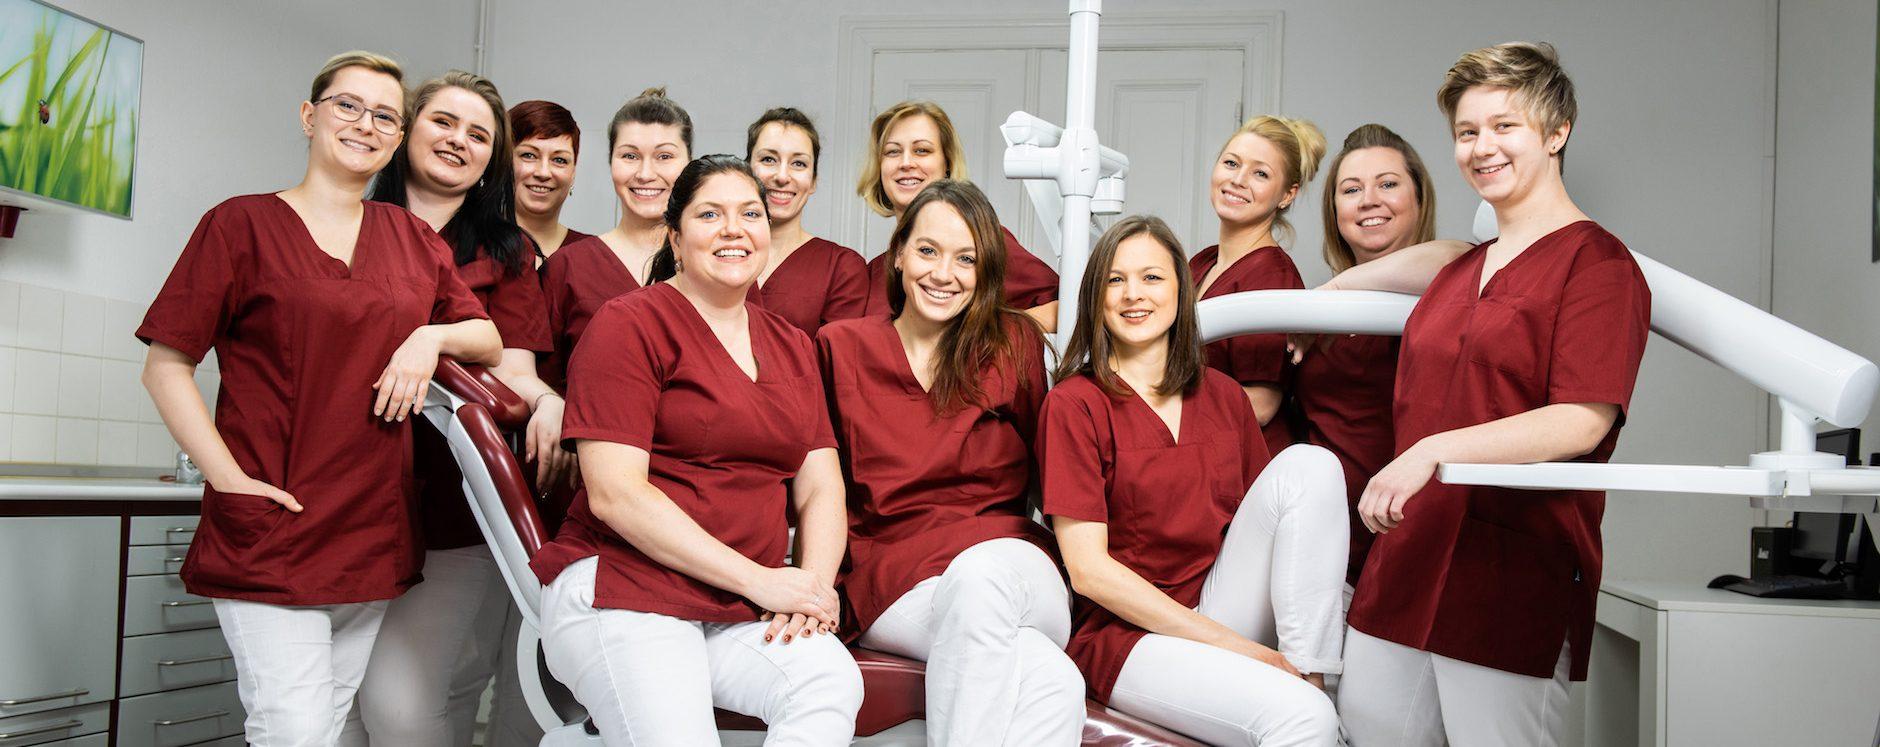 Zahnarzt berlin Lichtenberg Team